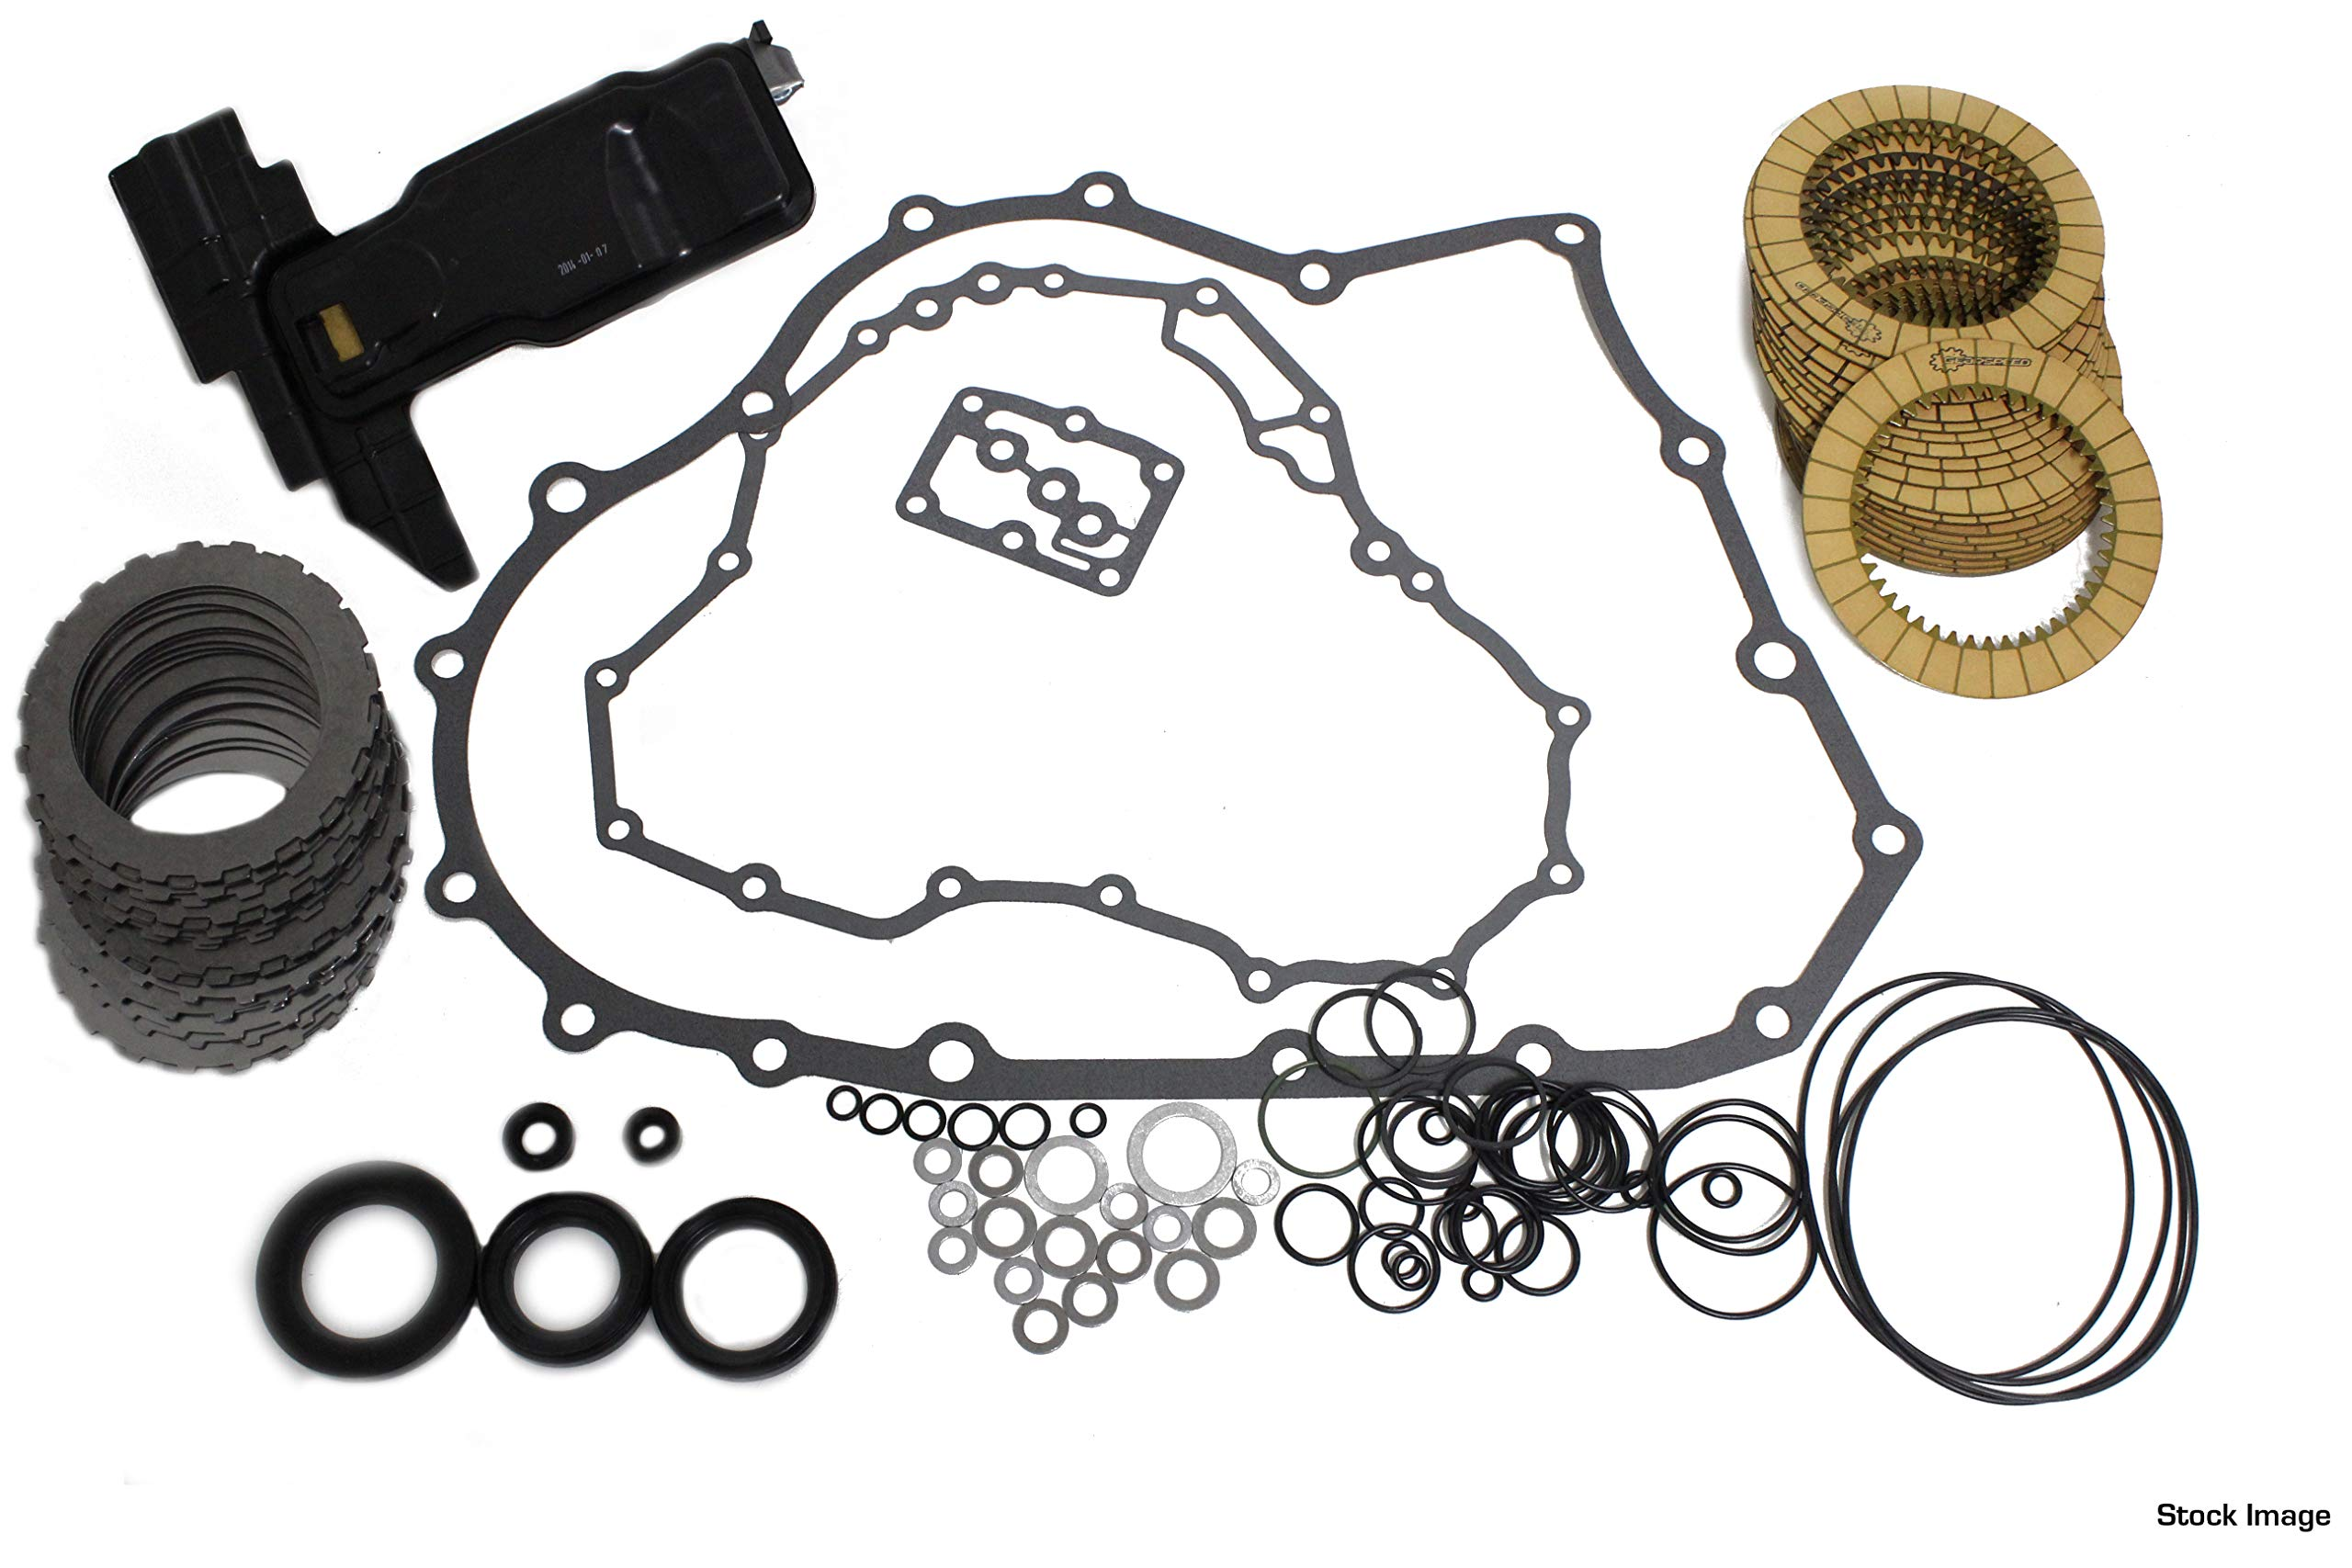 Transmission Rebuild Kit (MASTER) Compatible with 1998-2002 Honda Accord 4 Cylinder MAXA/BAXA